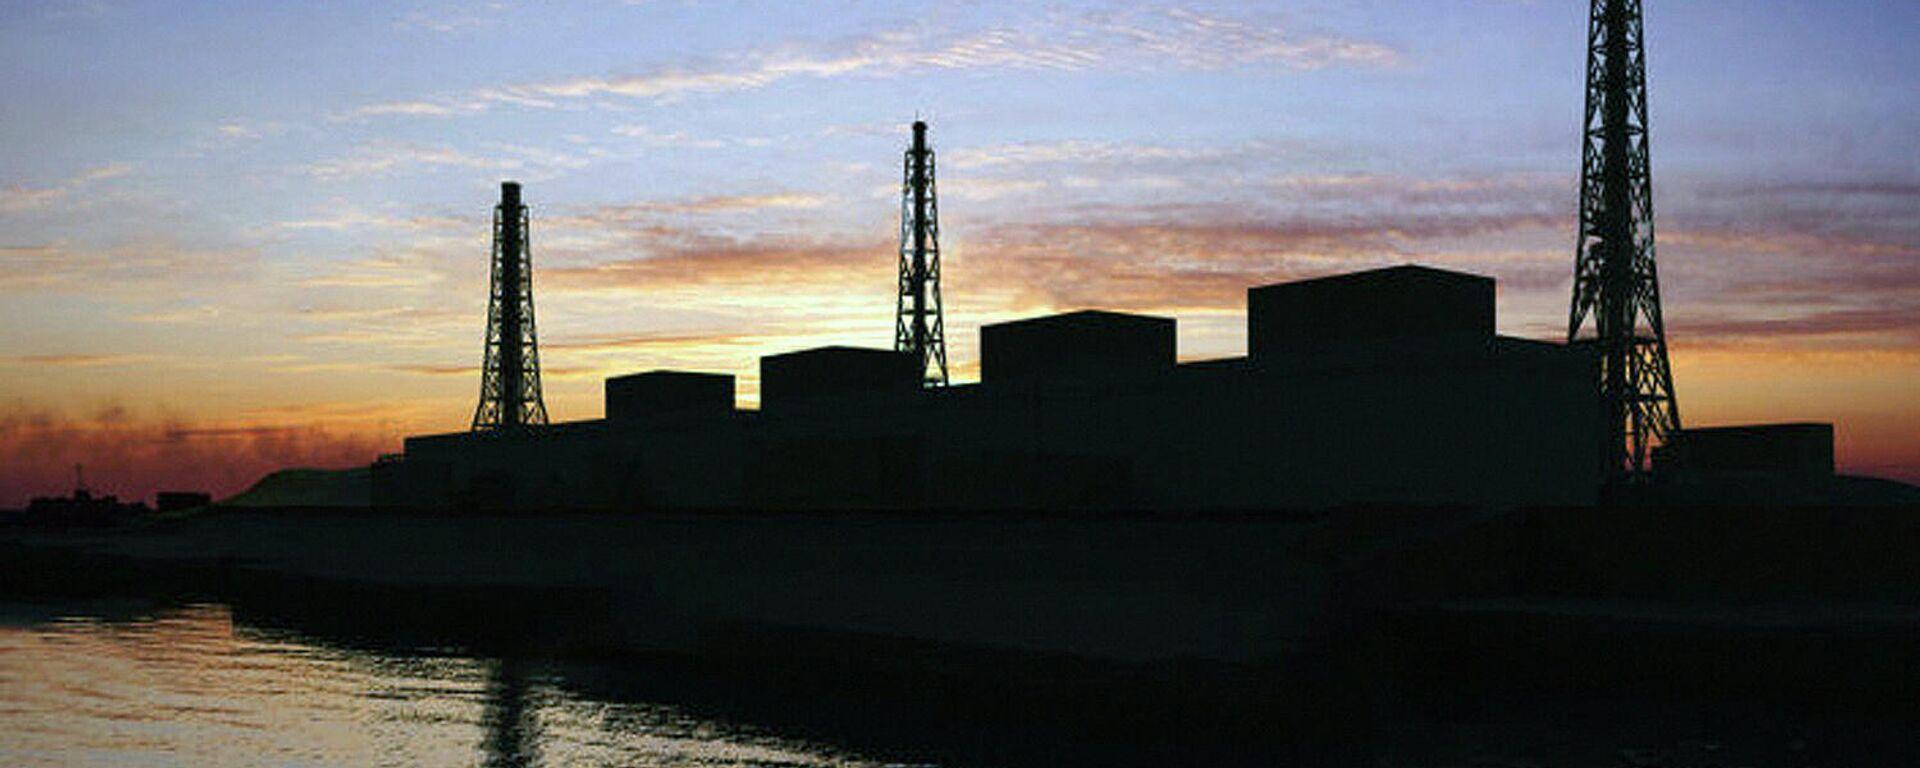 10 лет после аварии на АЭС: как живет Фукусима?  - Sputnik Узбекистан, 1920, 12.03.2021